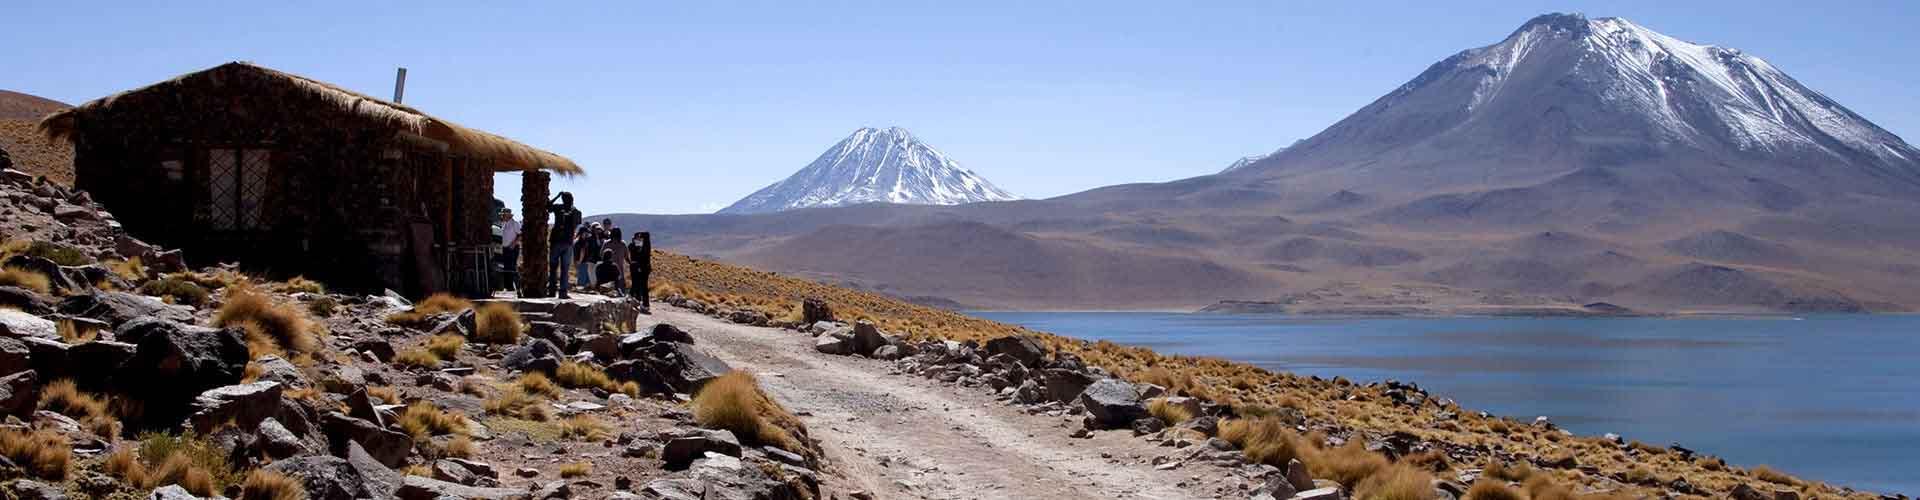 San Pedro de Atacama – Student accommodation, hostels and coworking spaces in San Pedro de Atacama (Chile). Maps of San Pedro de Atacama, photos and reviews for each place in San Pedro de Atacama.